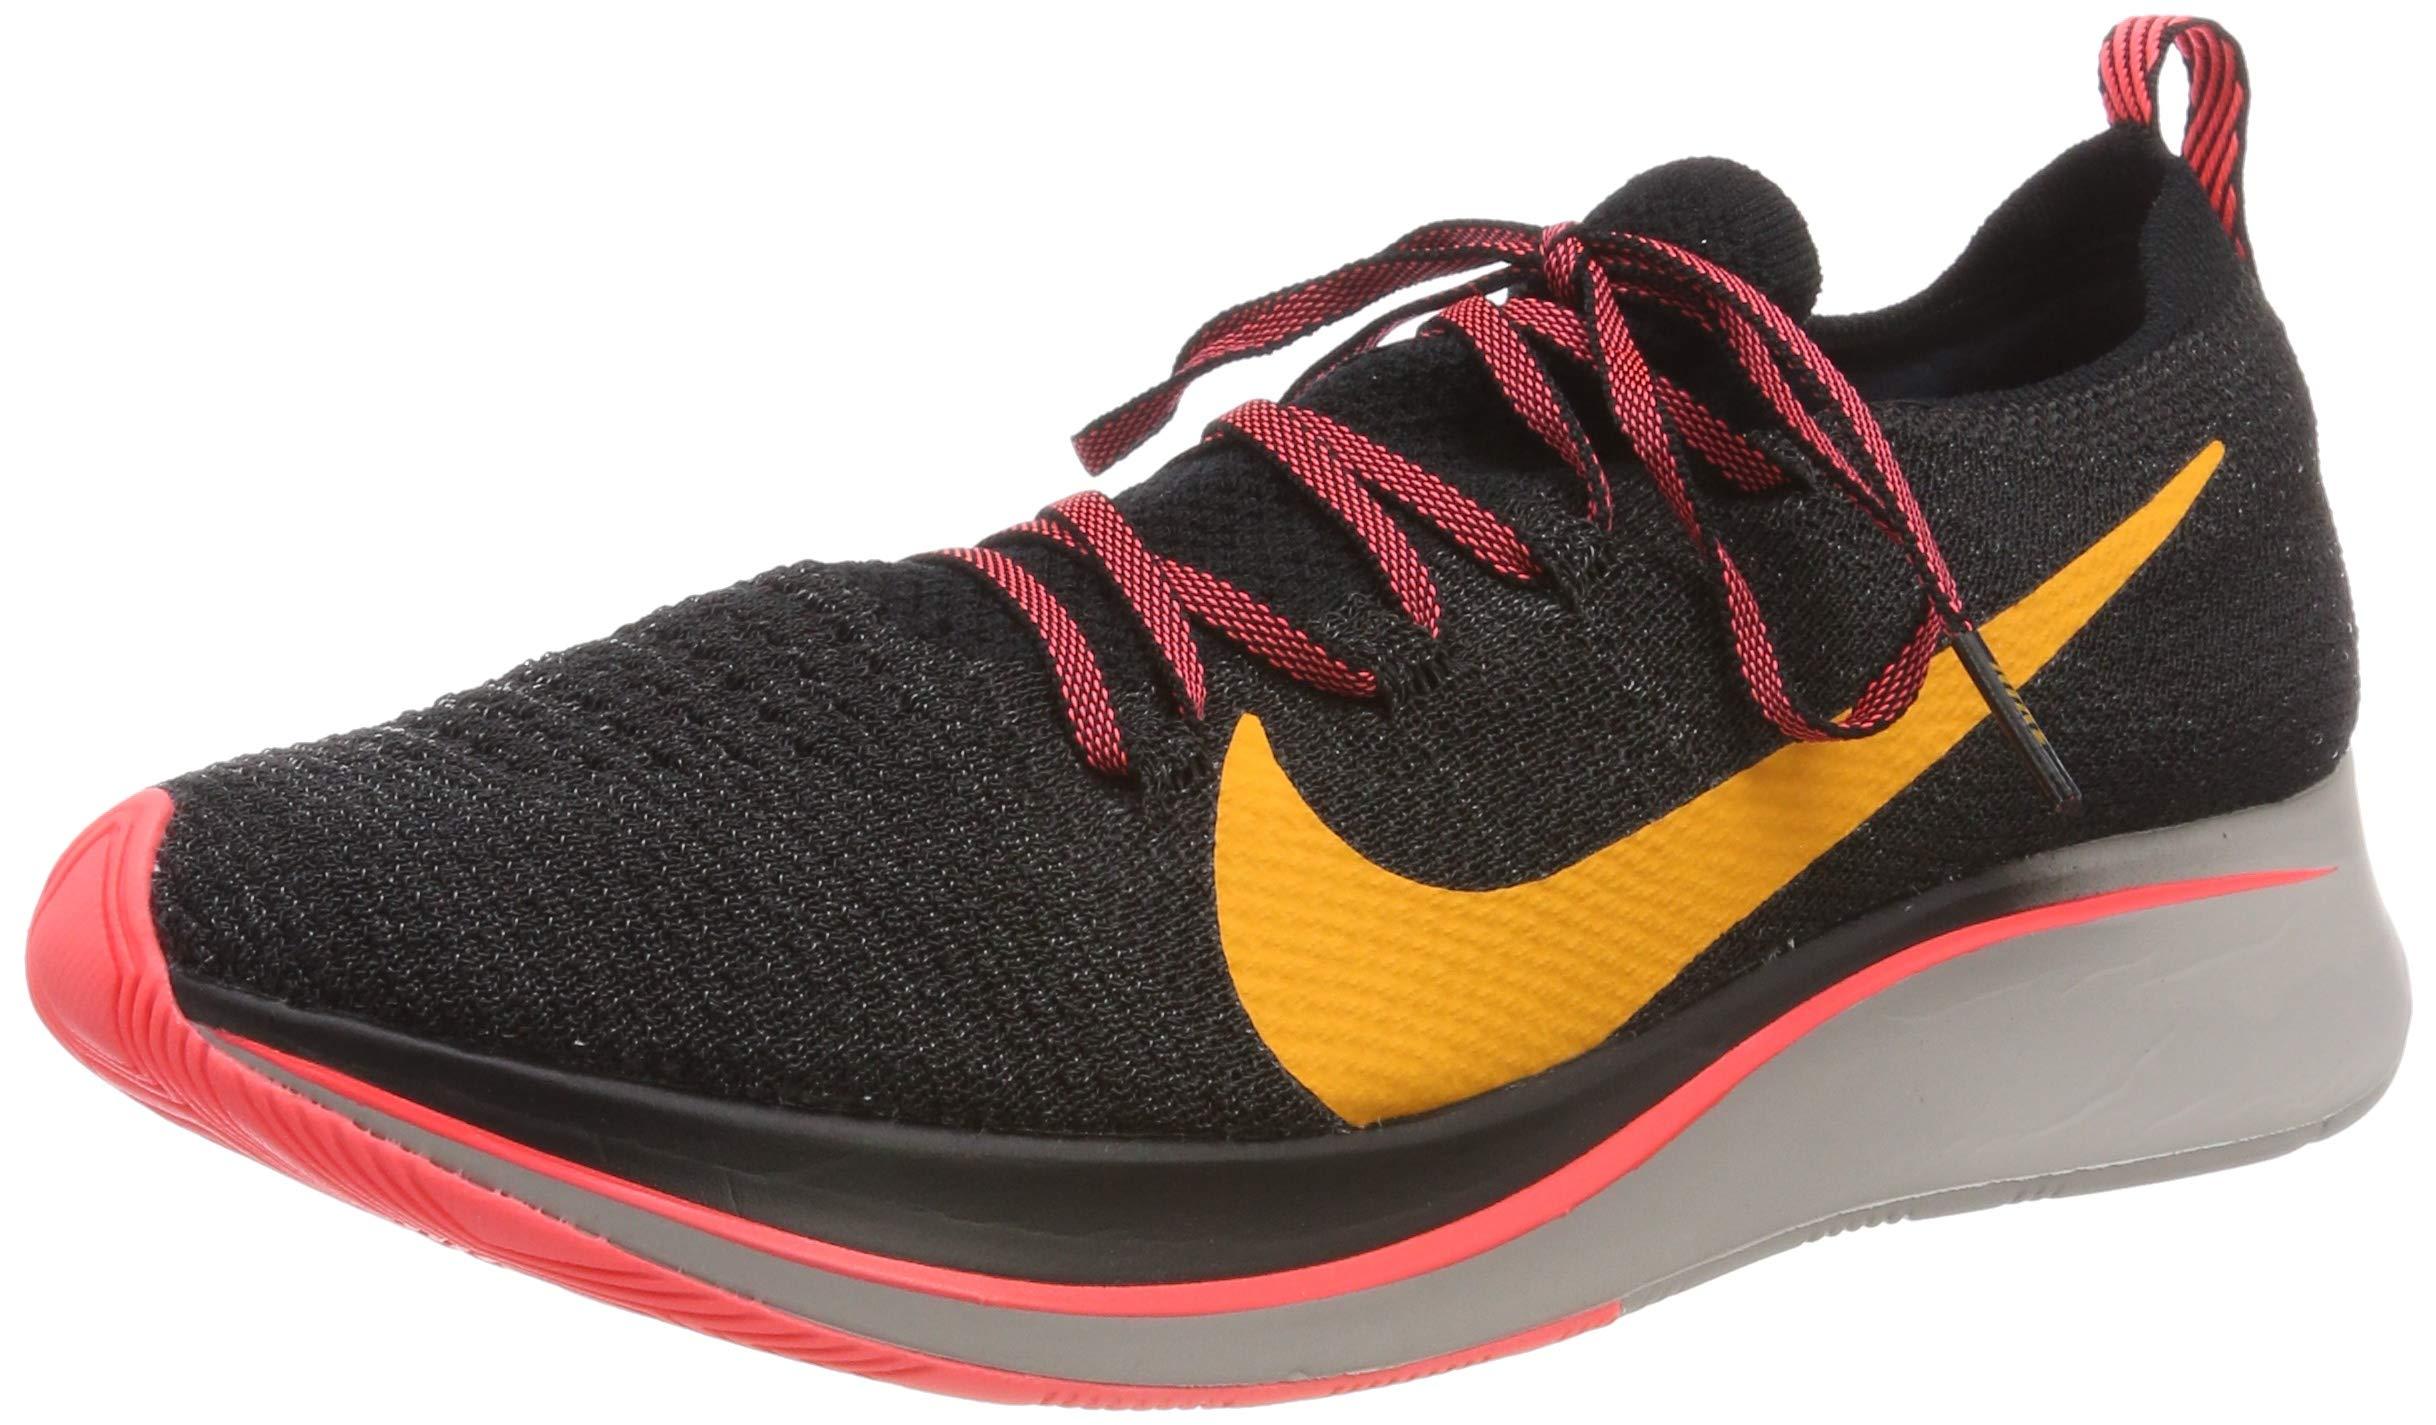 Nike Men's Zoom Fly Flyknit Black/Flash Crimson/Orange Peel Nylon Running Shoes 7.5 M US